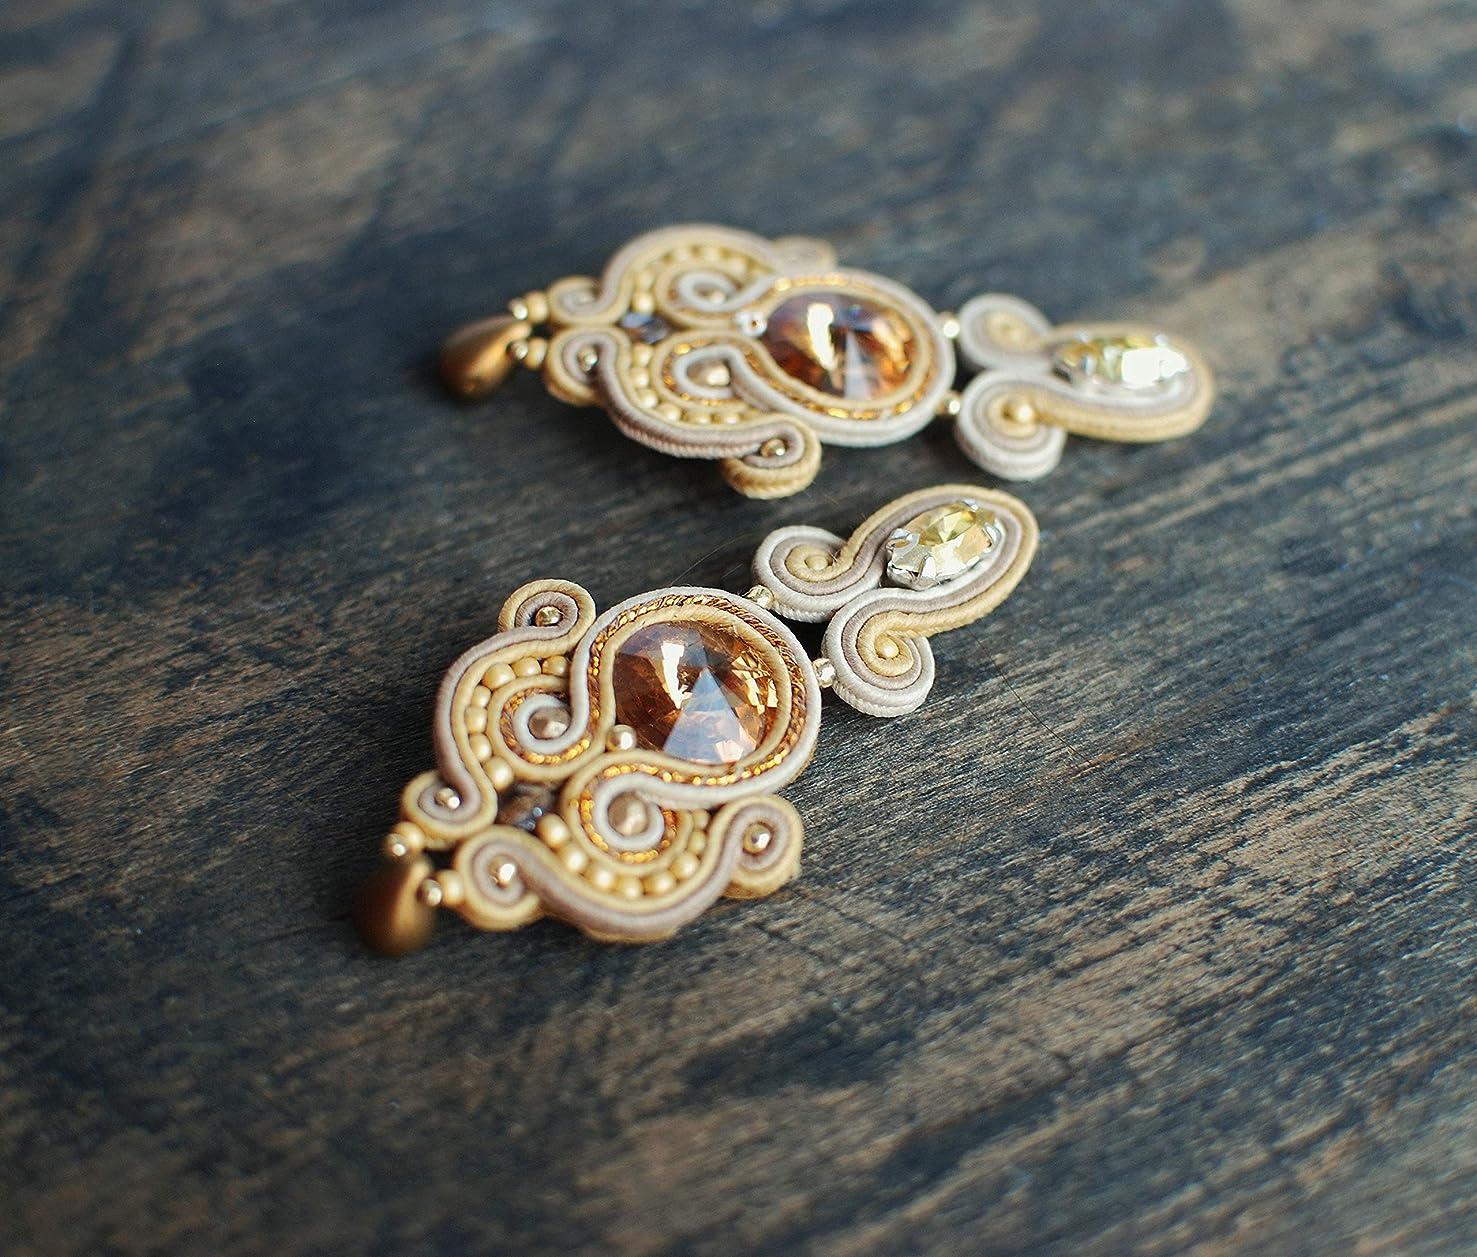 Soutache handmade dangle ivory beige gold orange earrings with Swarovski crystals, Embroidered beaded boho long shiny jewelry, Bohemian evening cocktail wedding bridal earrings, Ethnic oriental